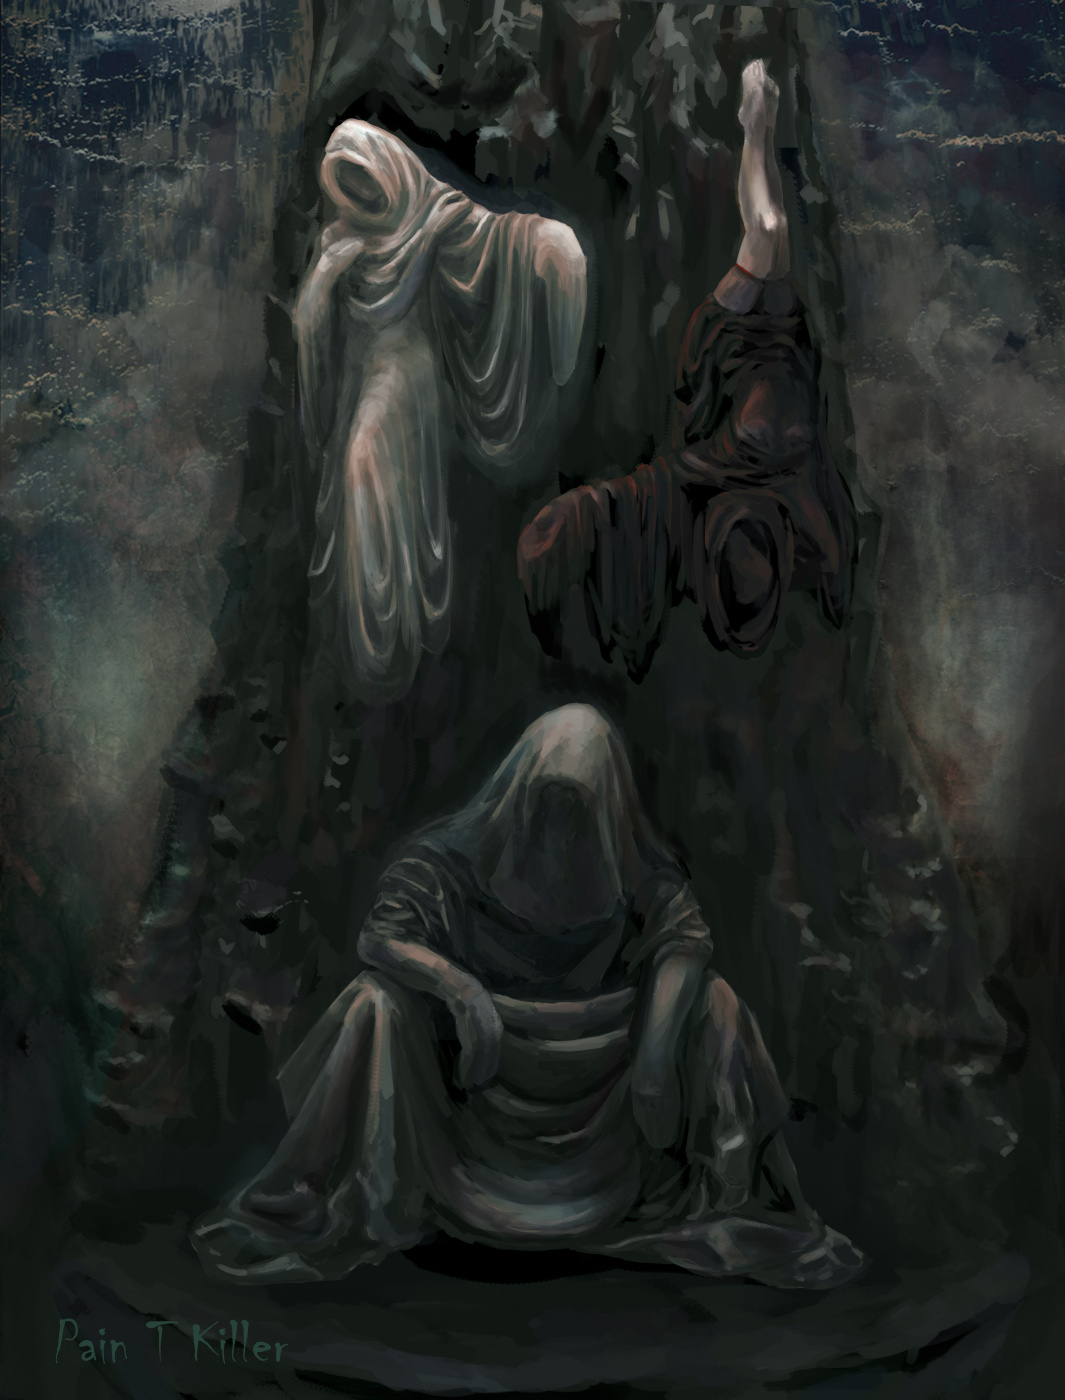 Pain T Killer. Between Ormuzd and Ahriman